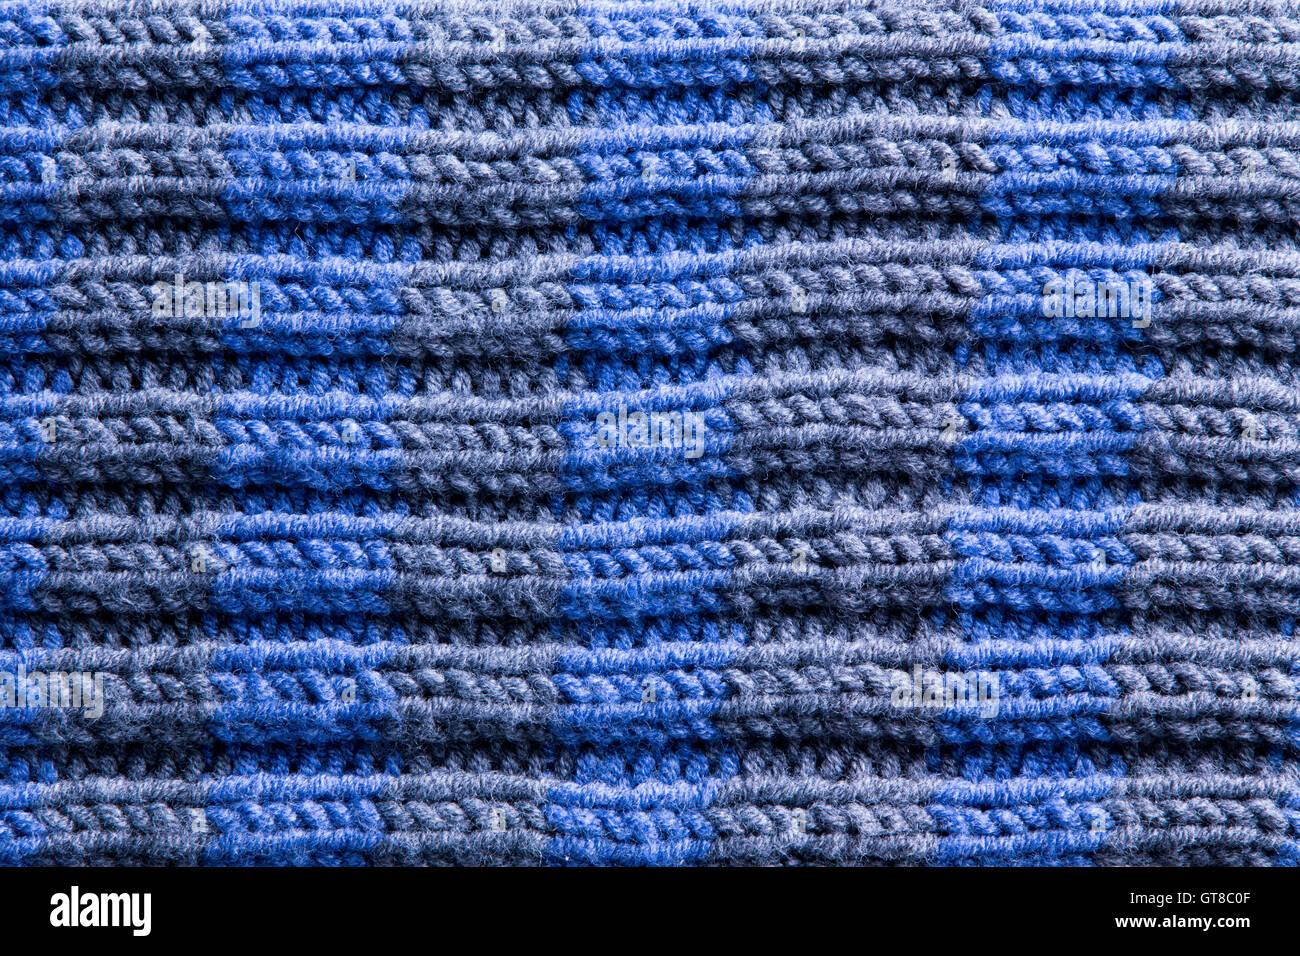 Famous Häkeln Zentrale Freie Muster Crest - Decke Stricken Muster ...